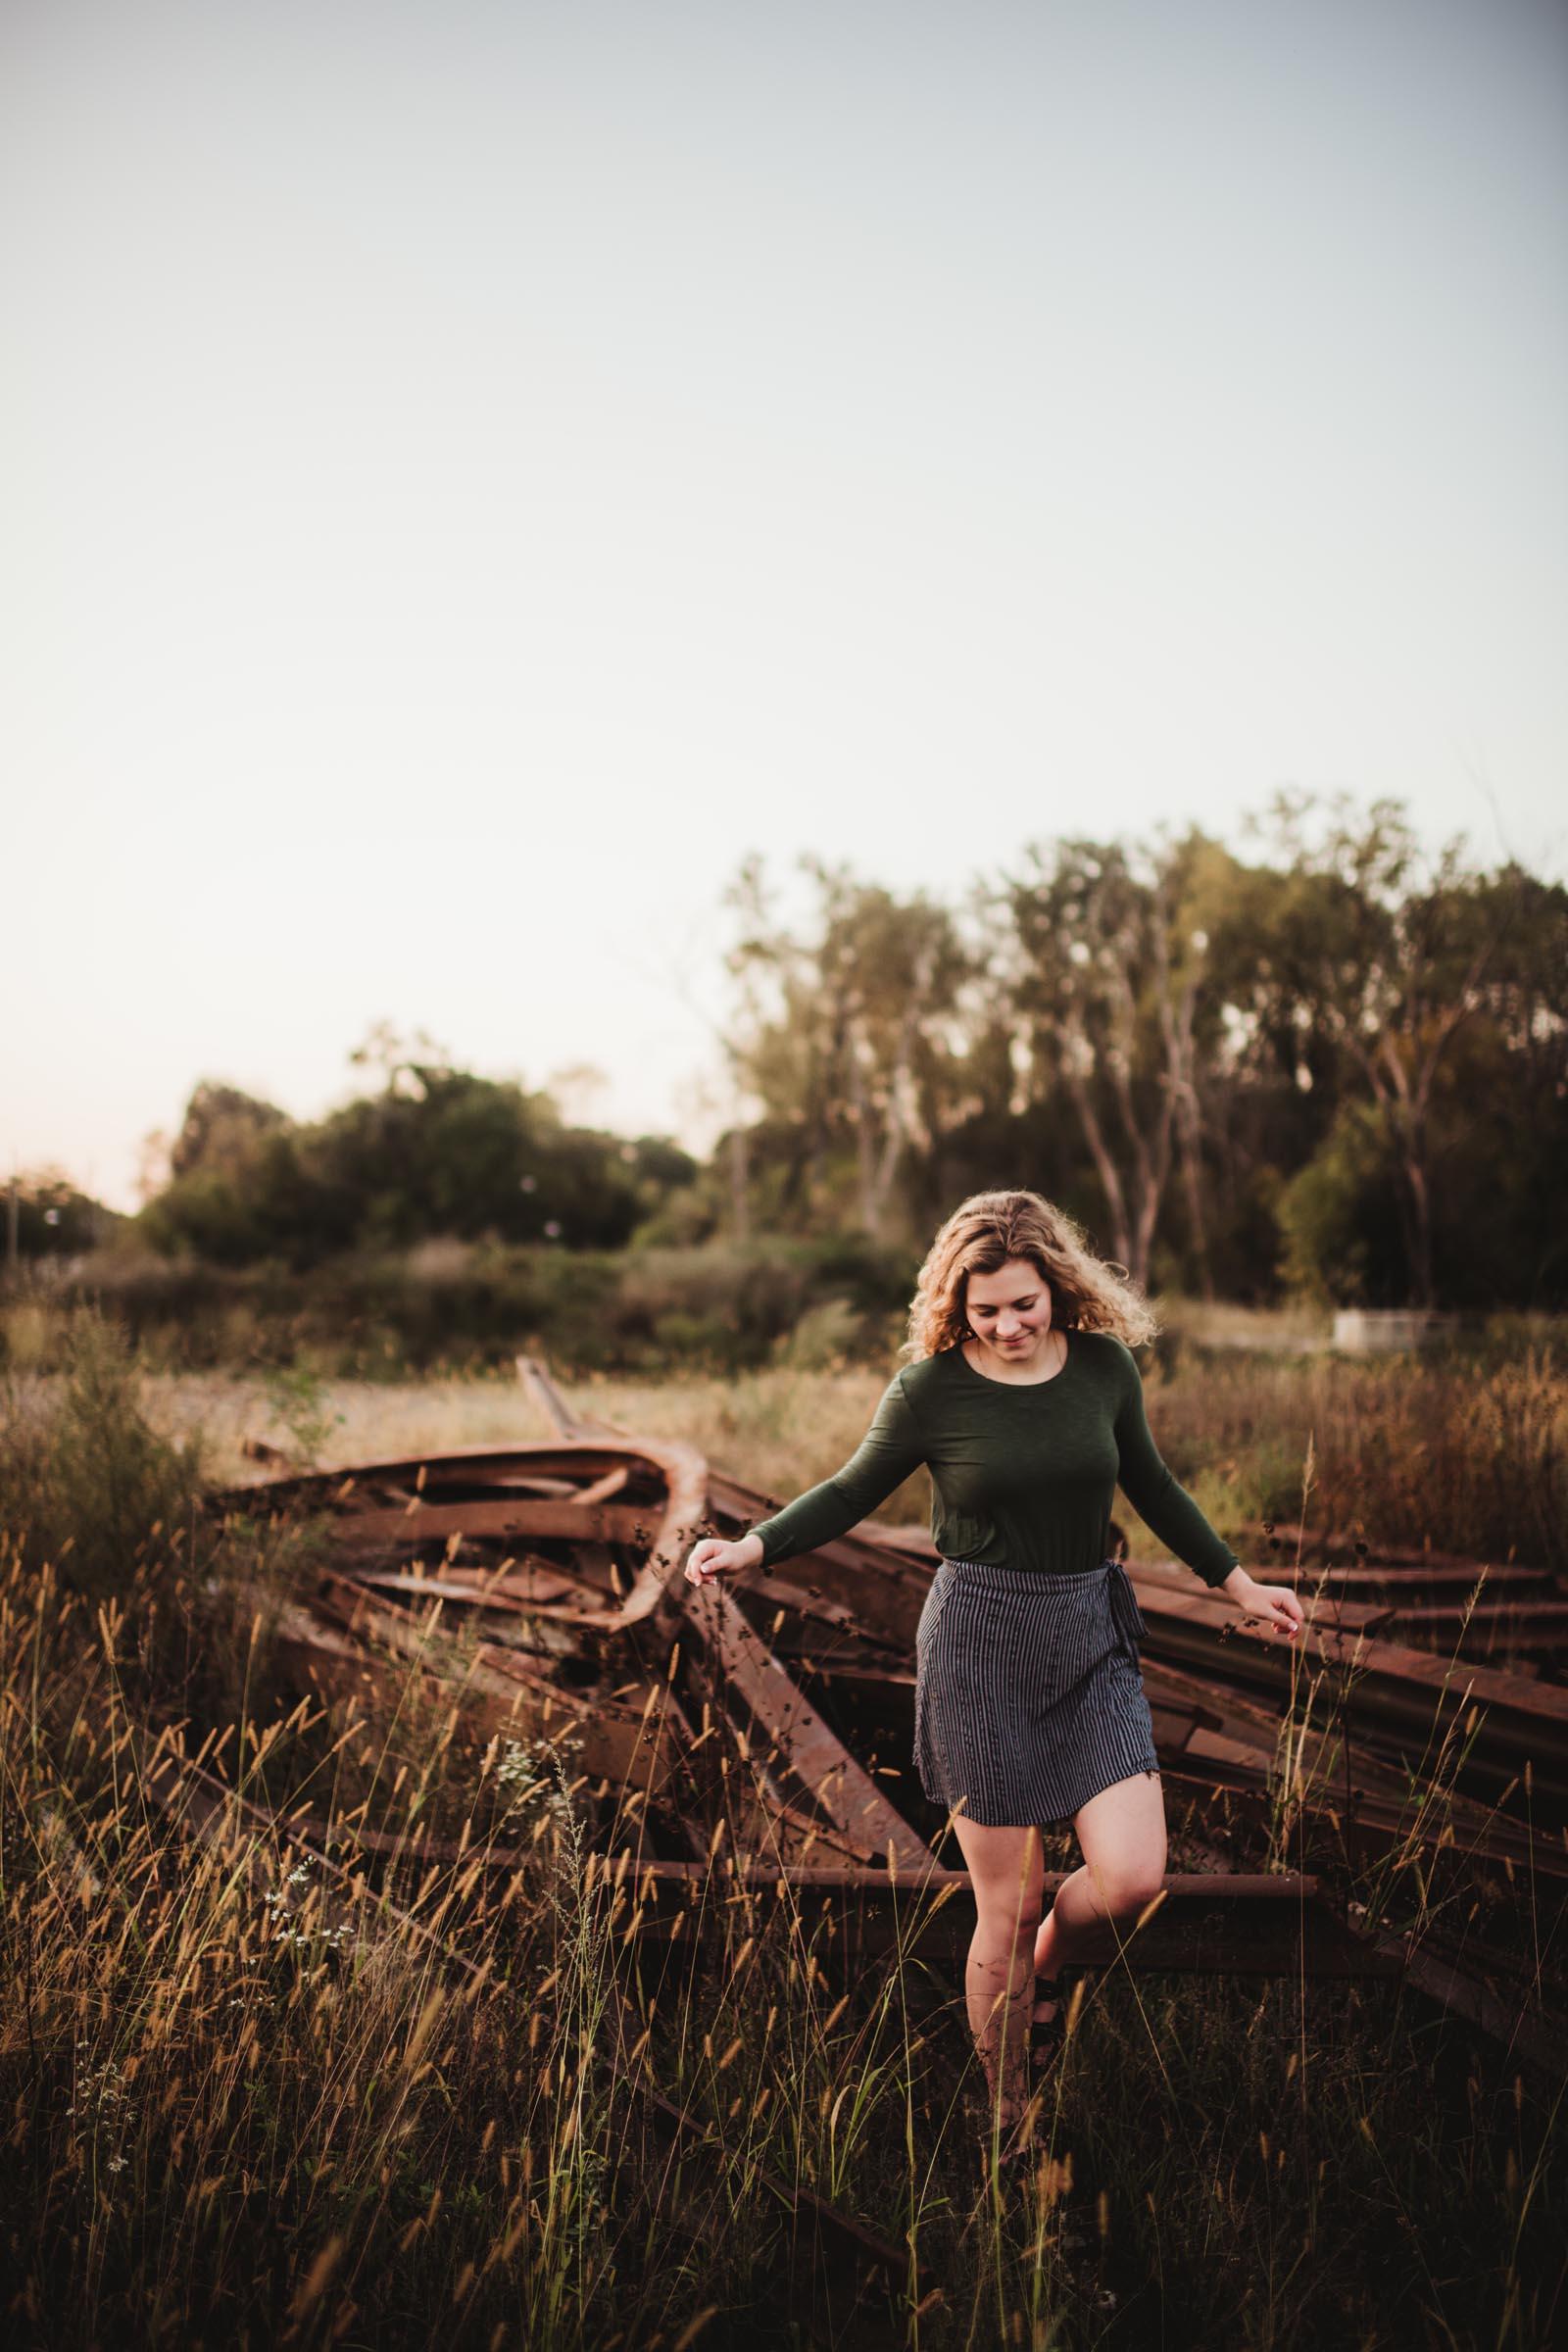 senior girl in a rustic field